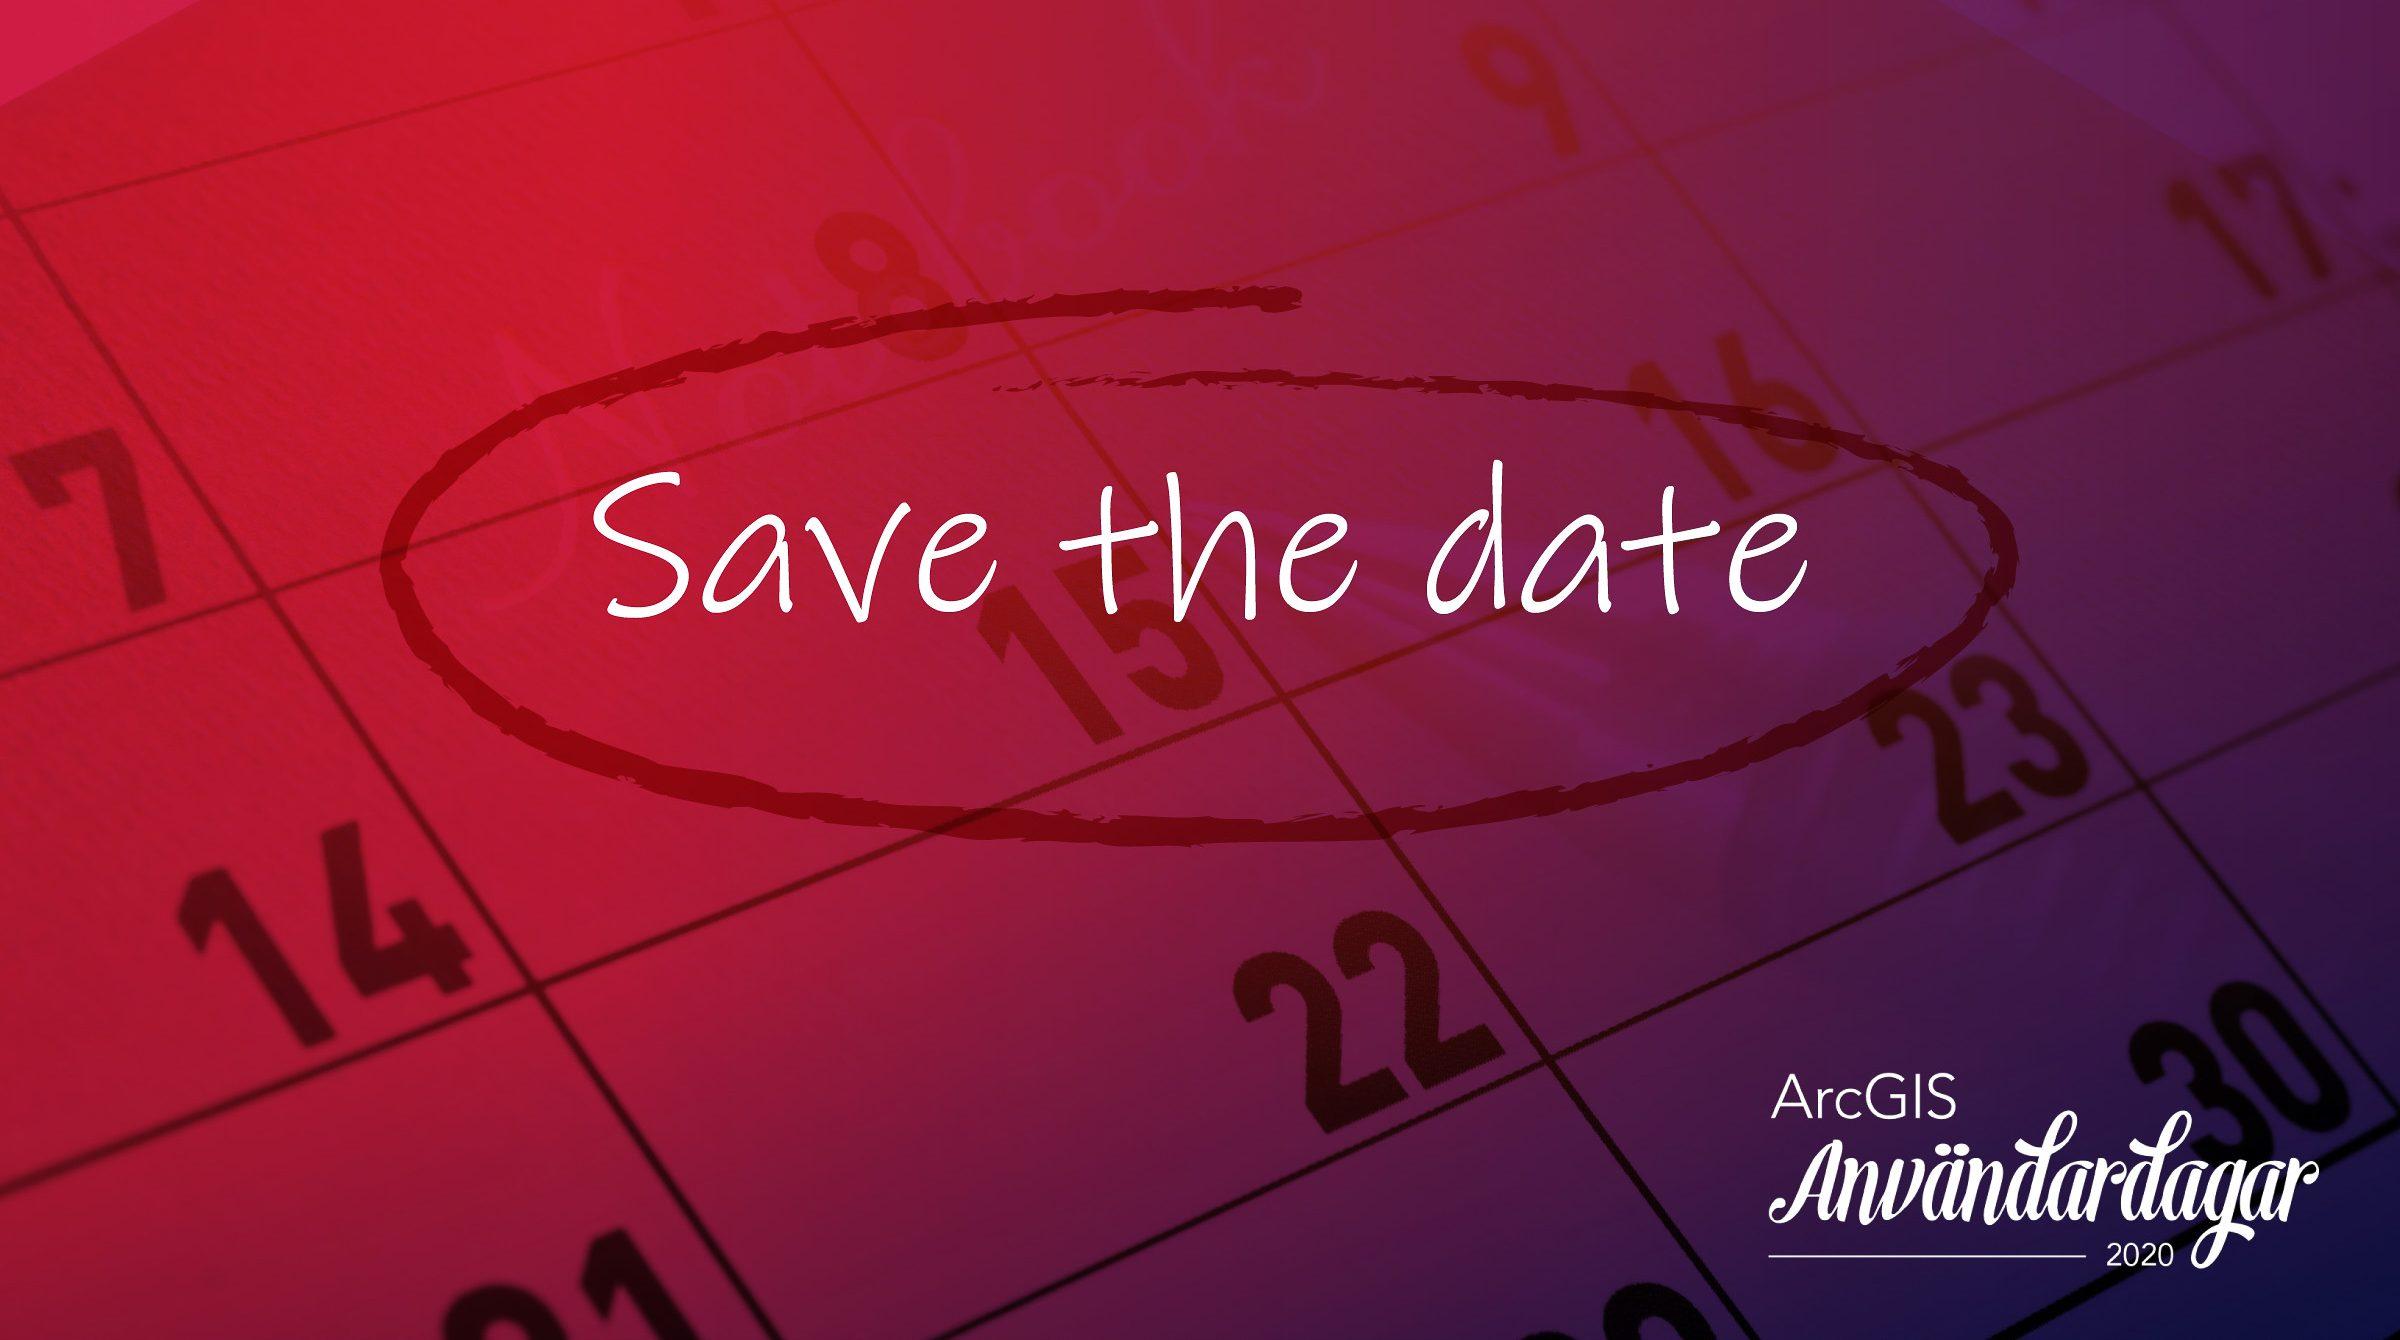 ArcGIS Användardagar 2020 - save the date